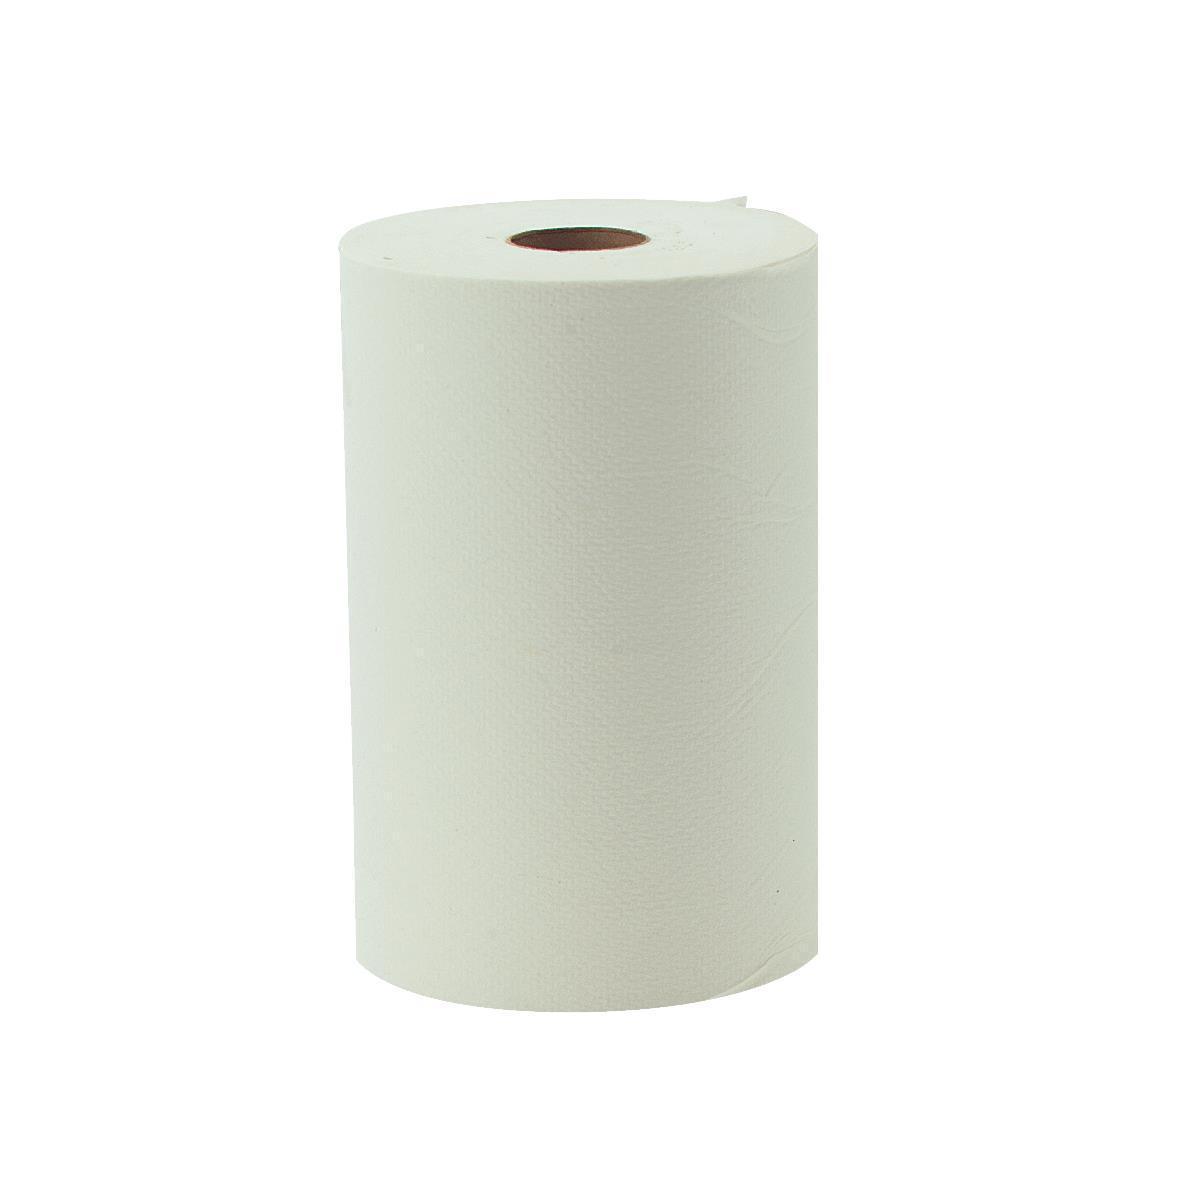 HOSTESS hand towels, folded, natural (24 sleeves of 168 sheets)